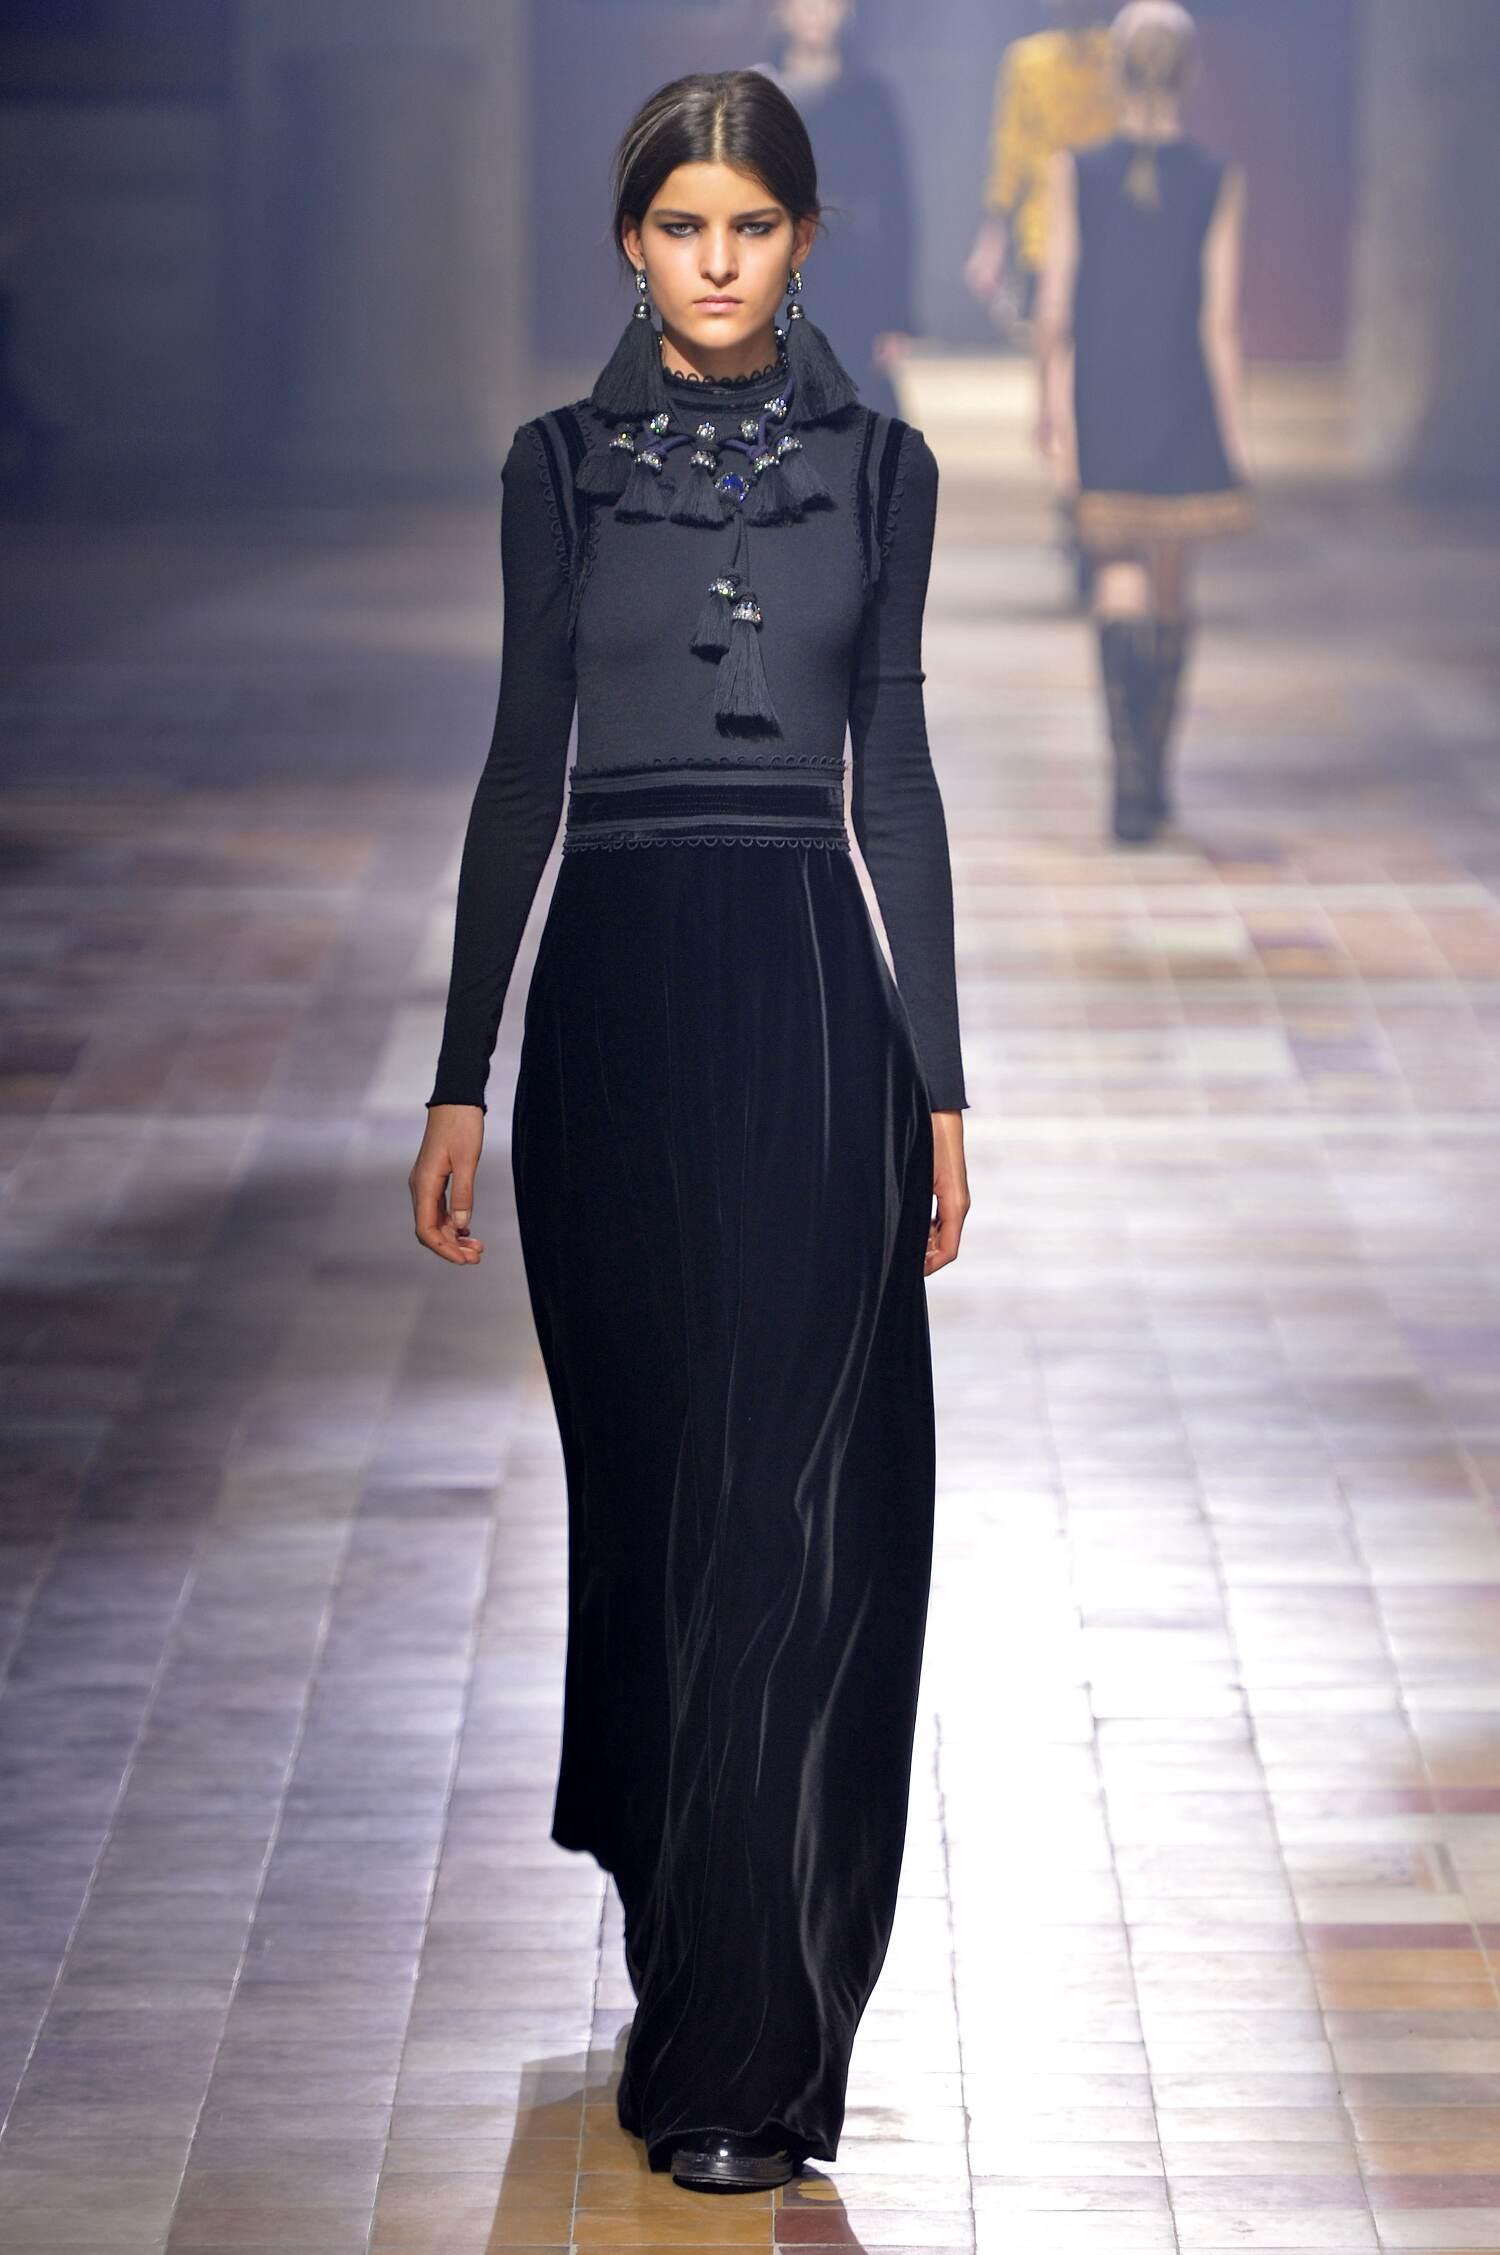 Lanvin Fall Winter 2015 16 Womenswear Paris Fashion Week